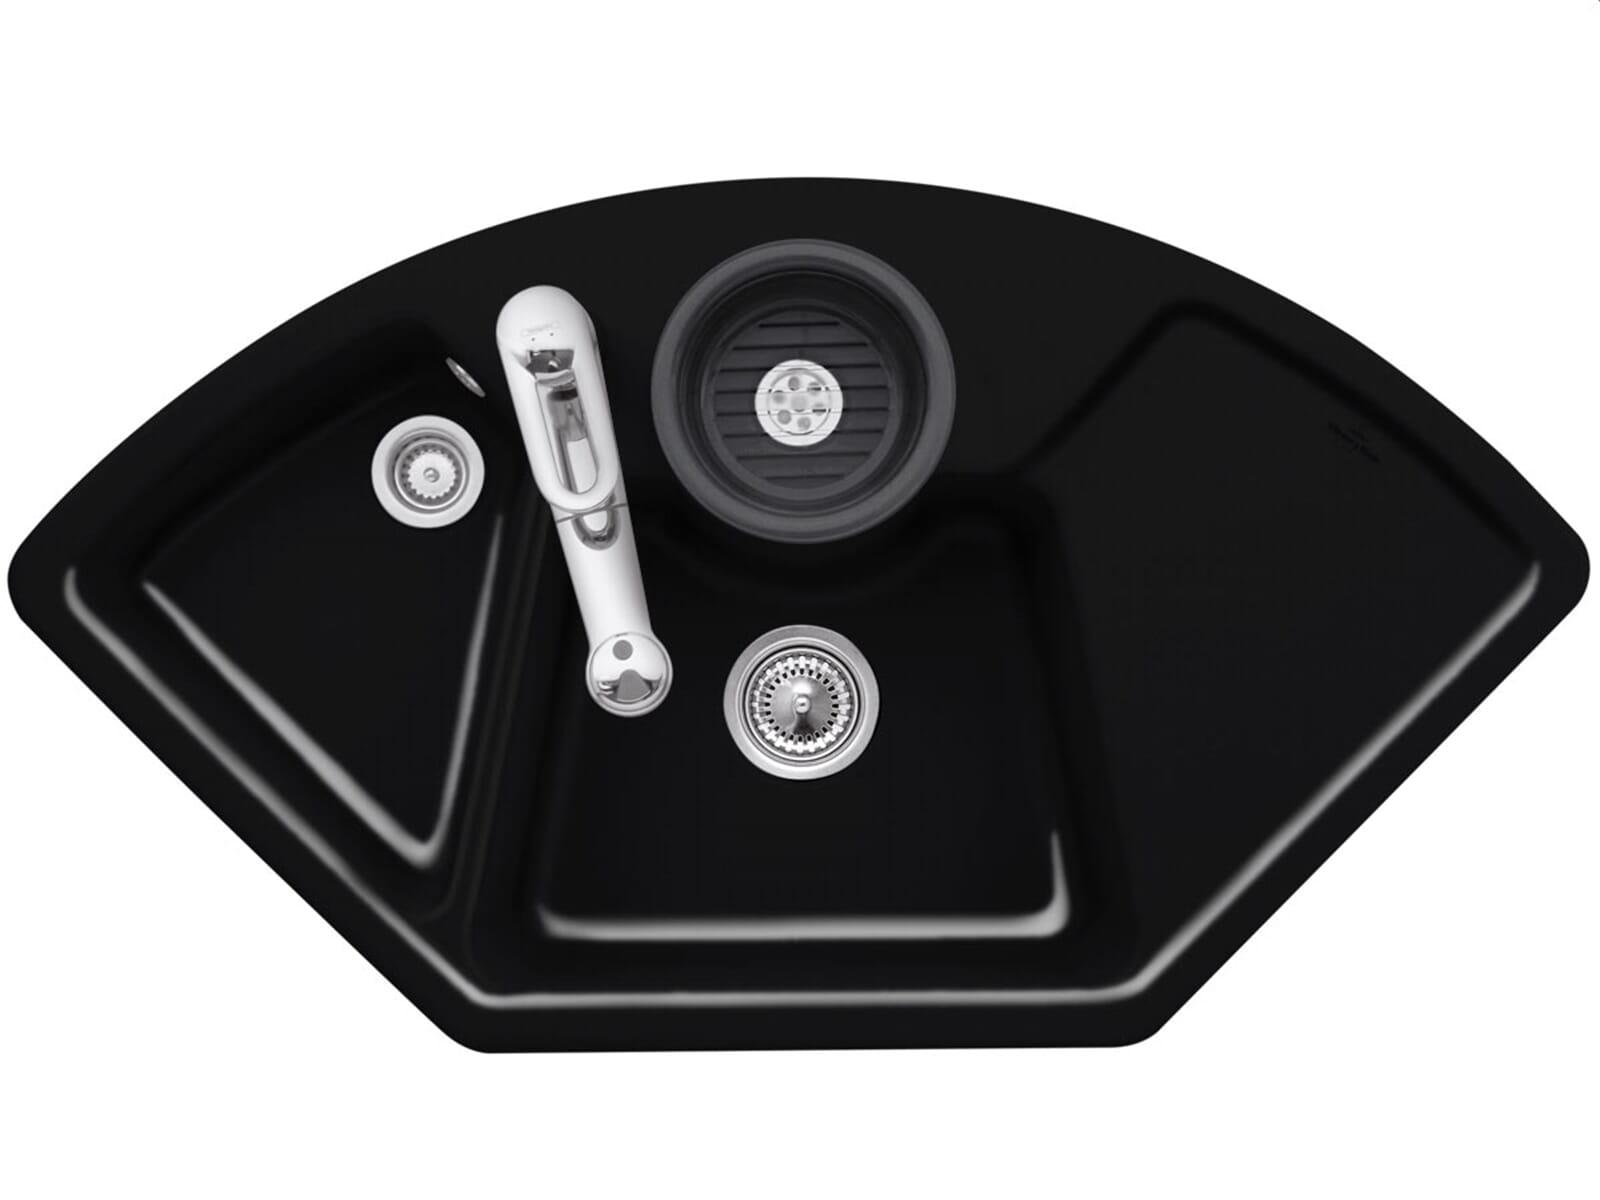 Villeroy & Boch Solo Eck Chromit - 6708 01 J0 Keramikspüle Handbetätigung